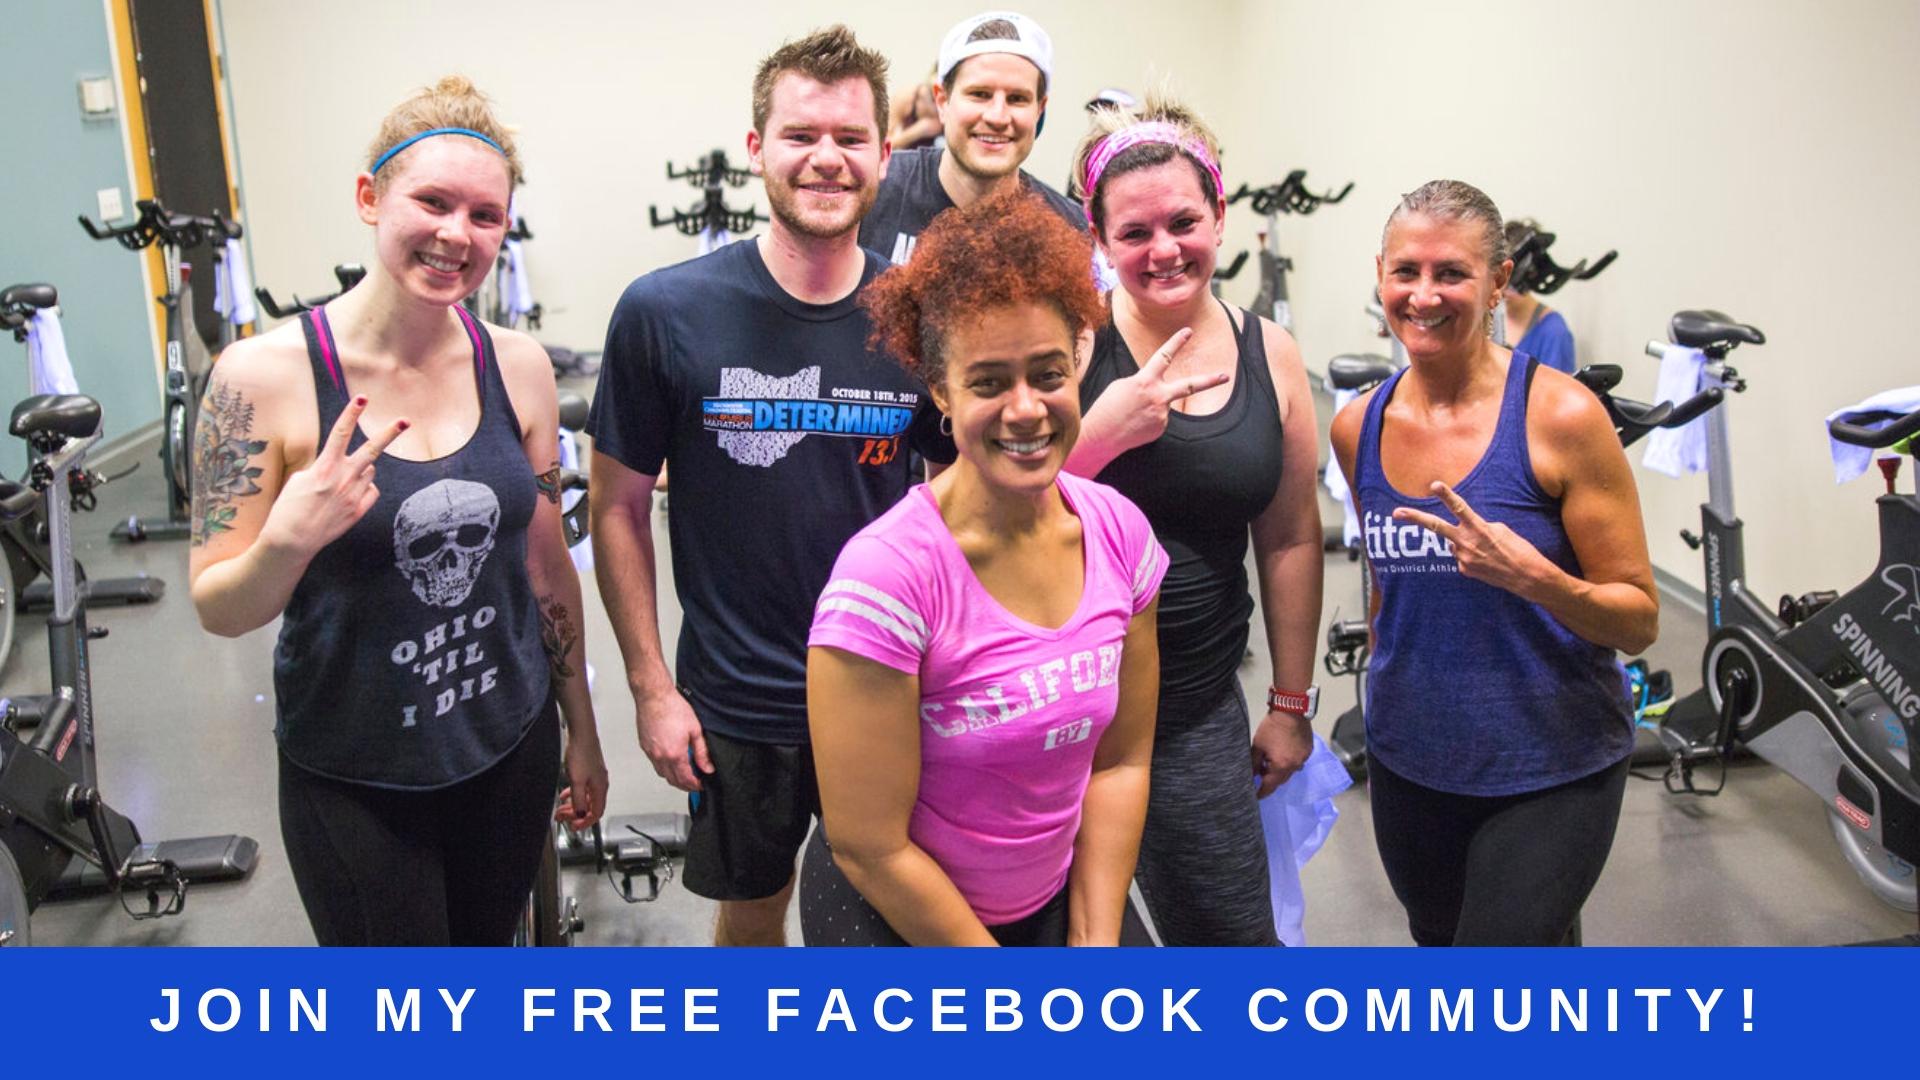 Velmanator • Velma Garnes • MET Melt • Personal Training • Clean Eating • Fitness • Health • Wellness • Muscles • Tone • Tighten • Spinning